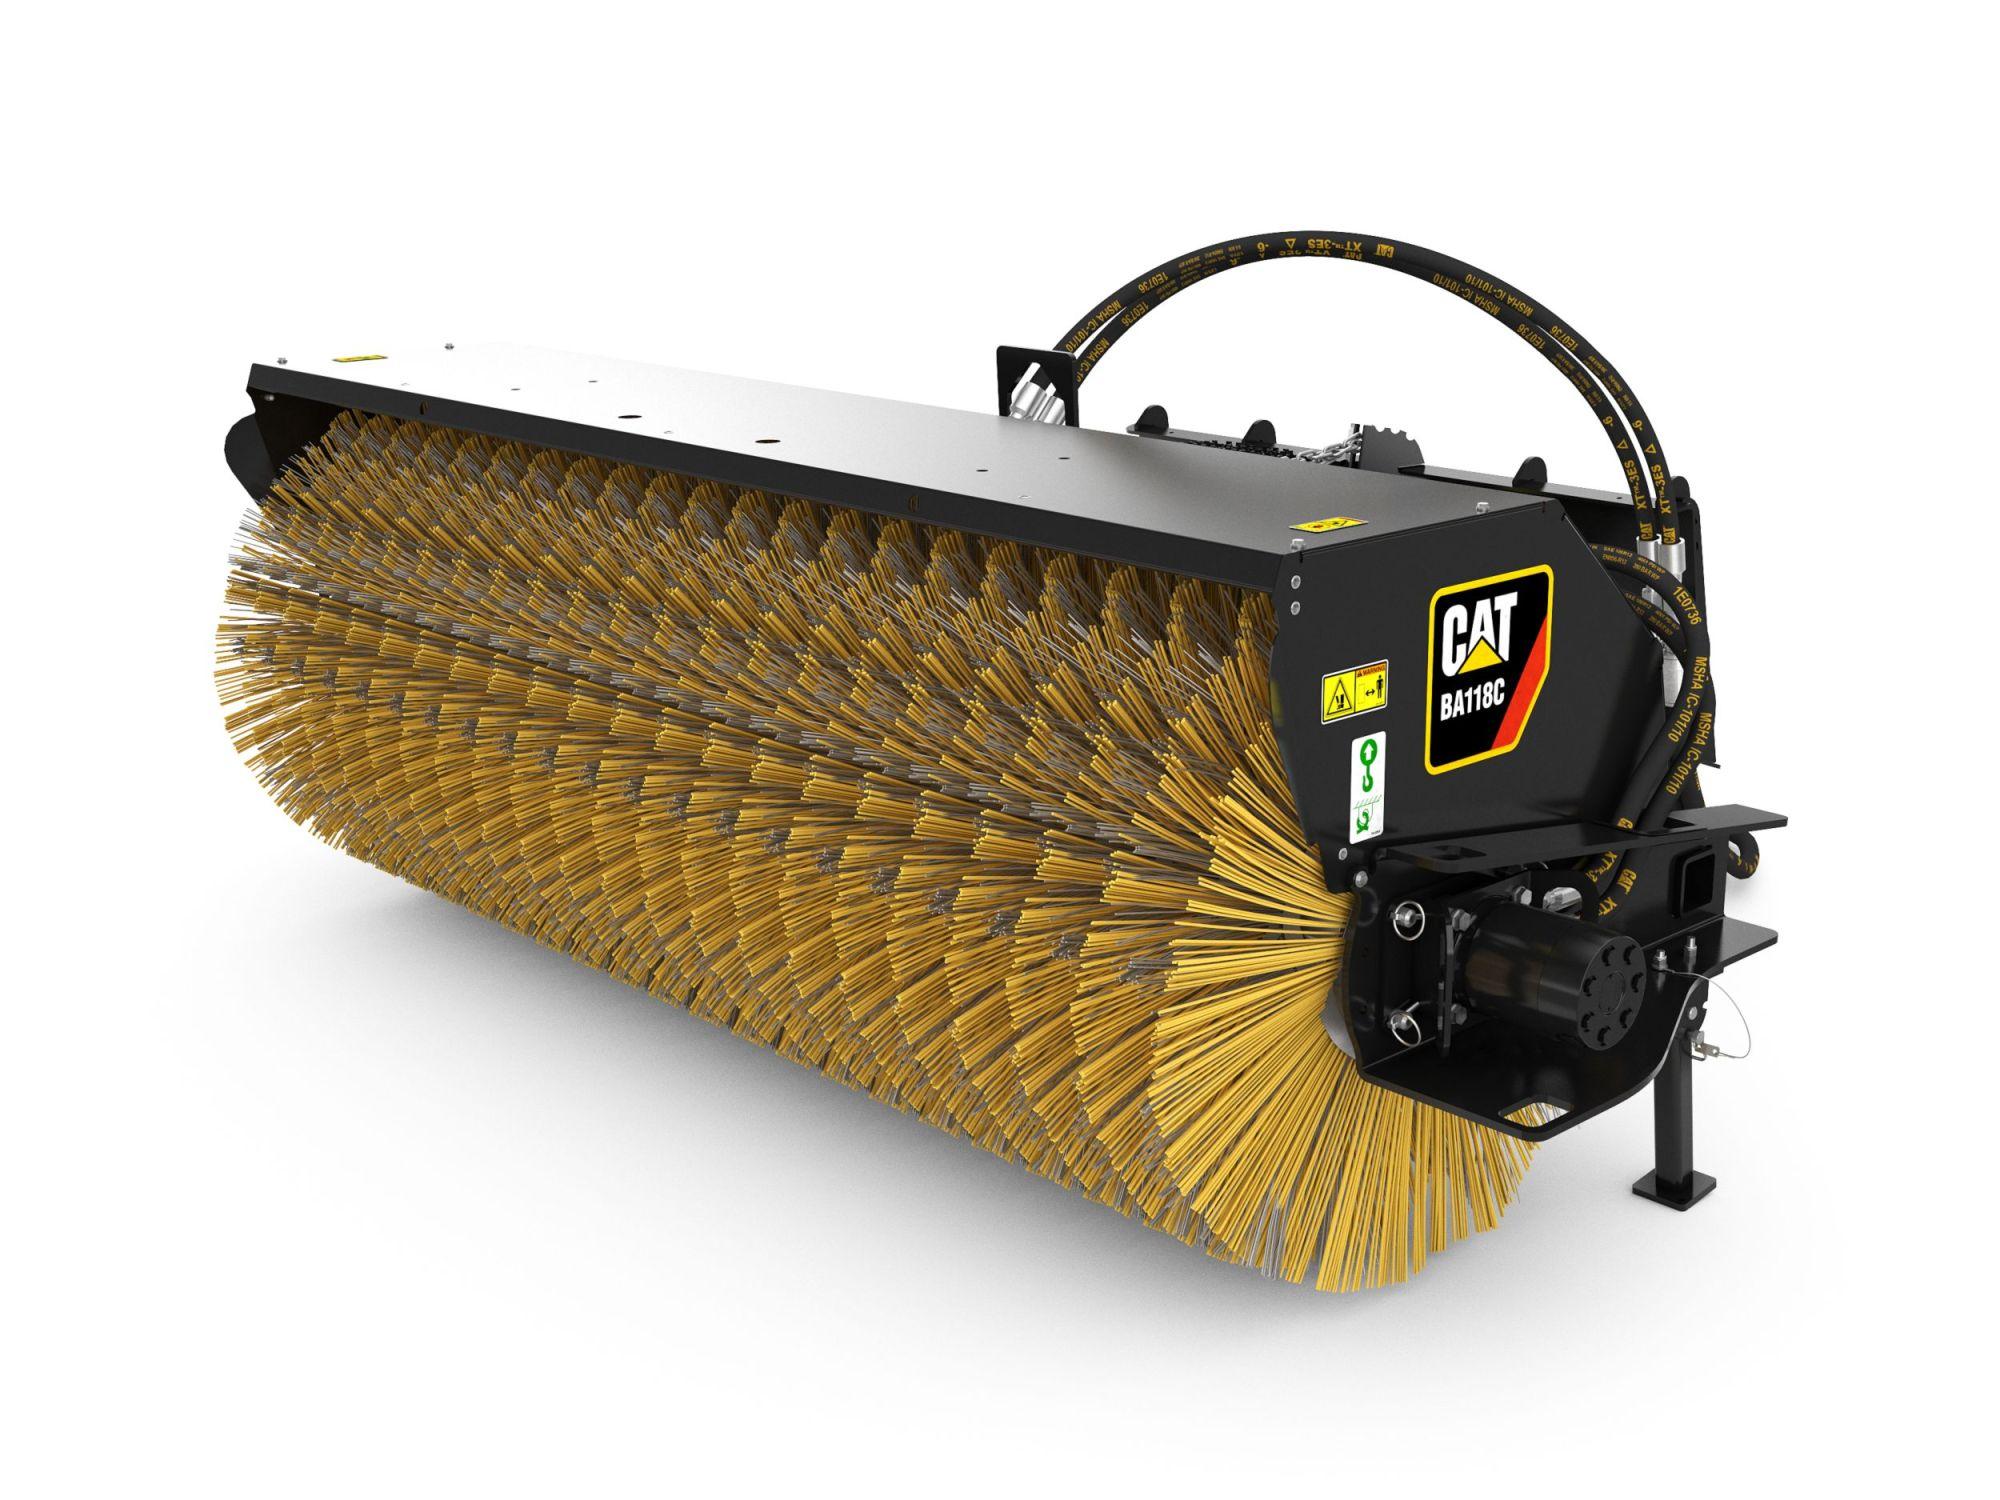 hight resolution of ba118c hydraulic ba118c manual